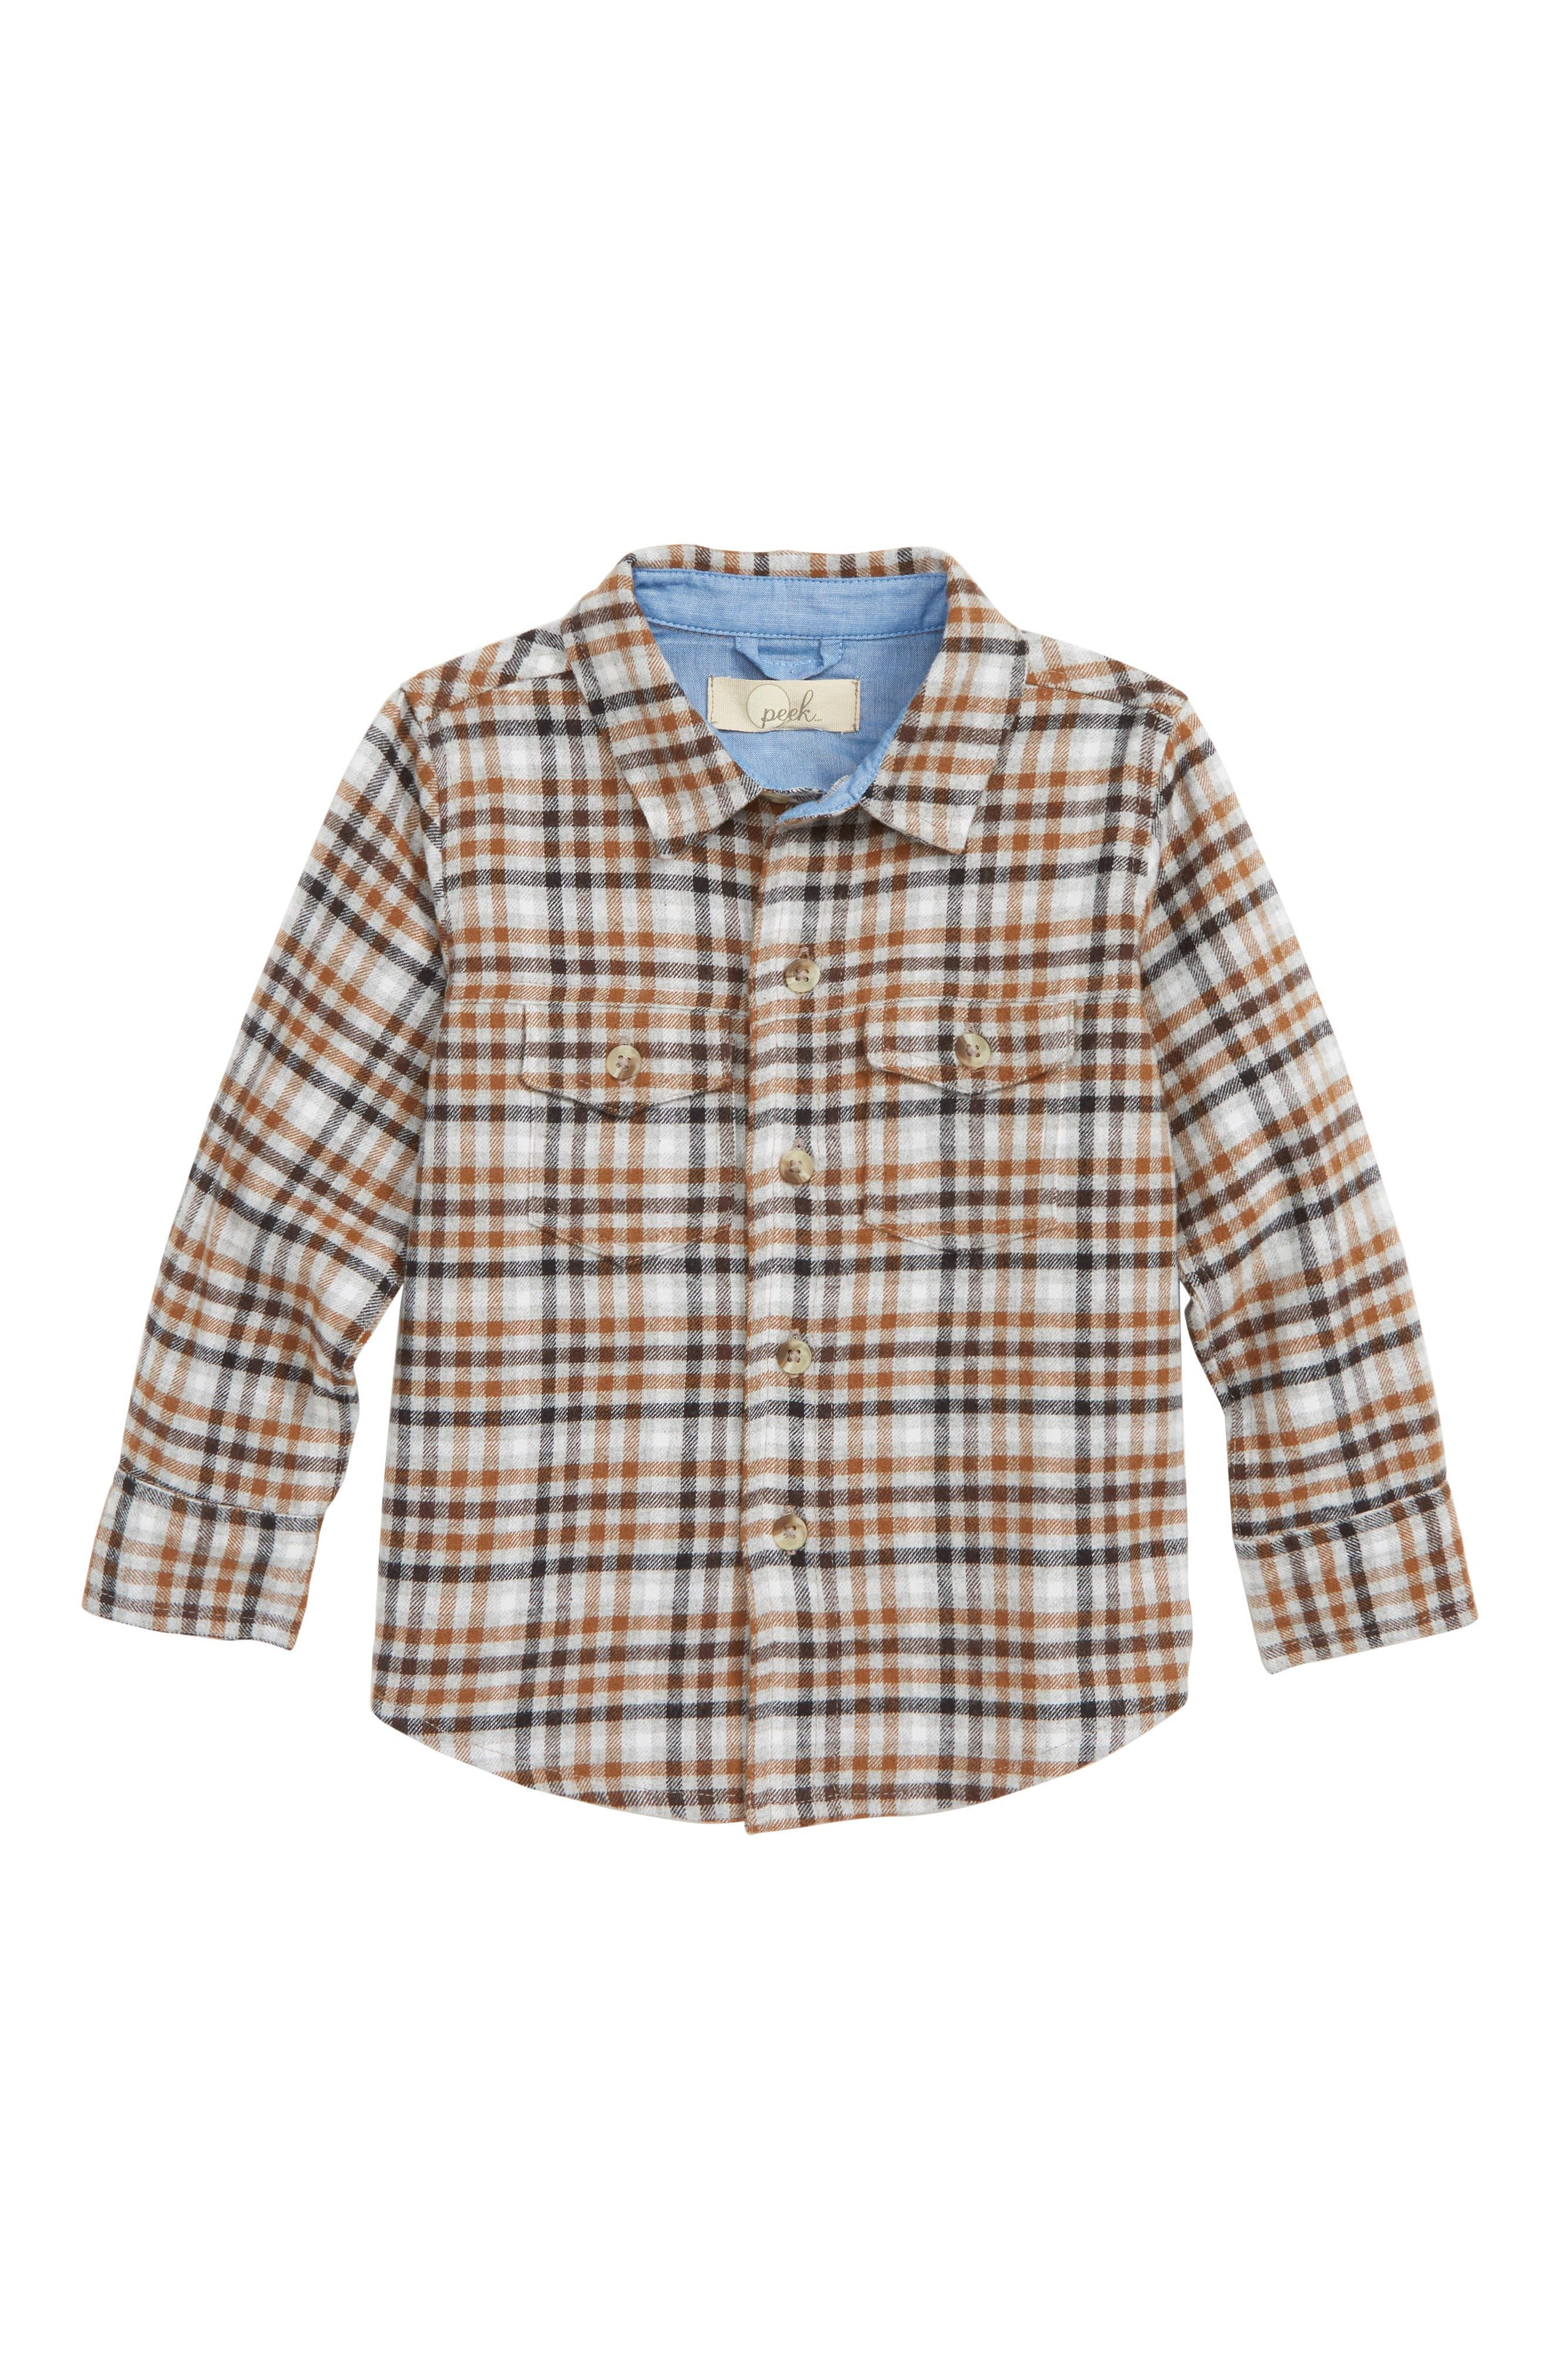 Toddler Boys Peek Tristan Plaid Flannel Shirt Size 3T  Brown